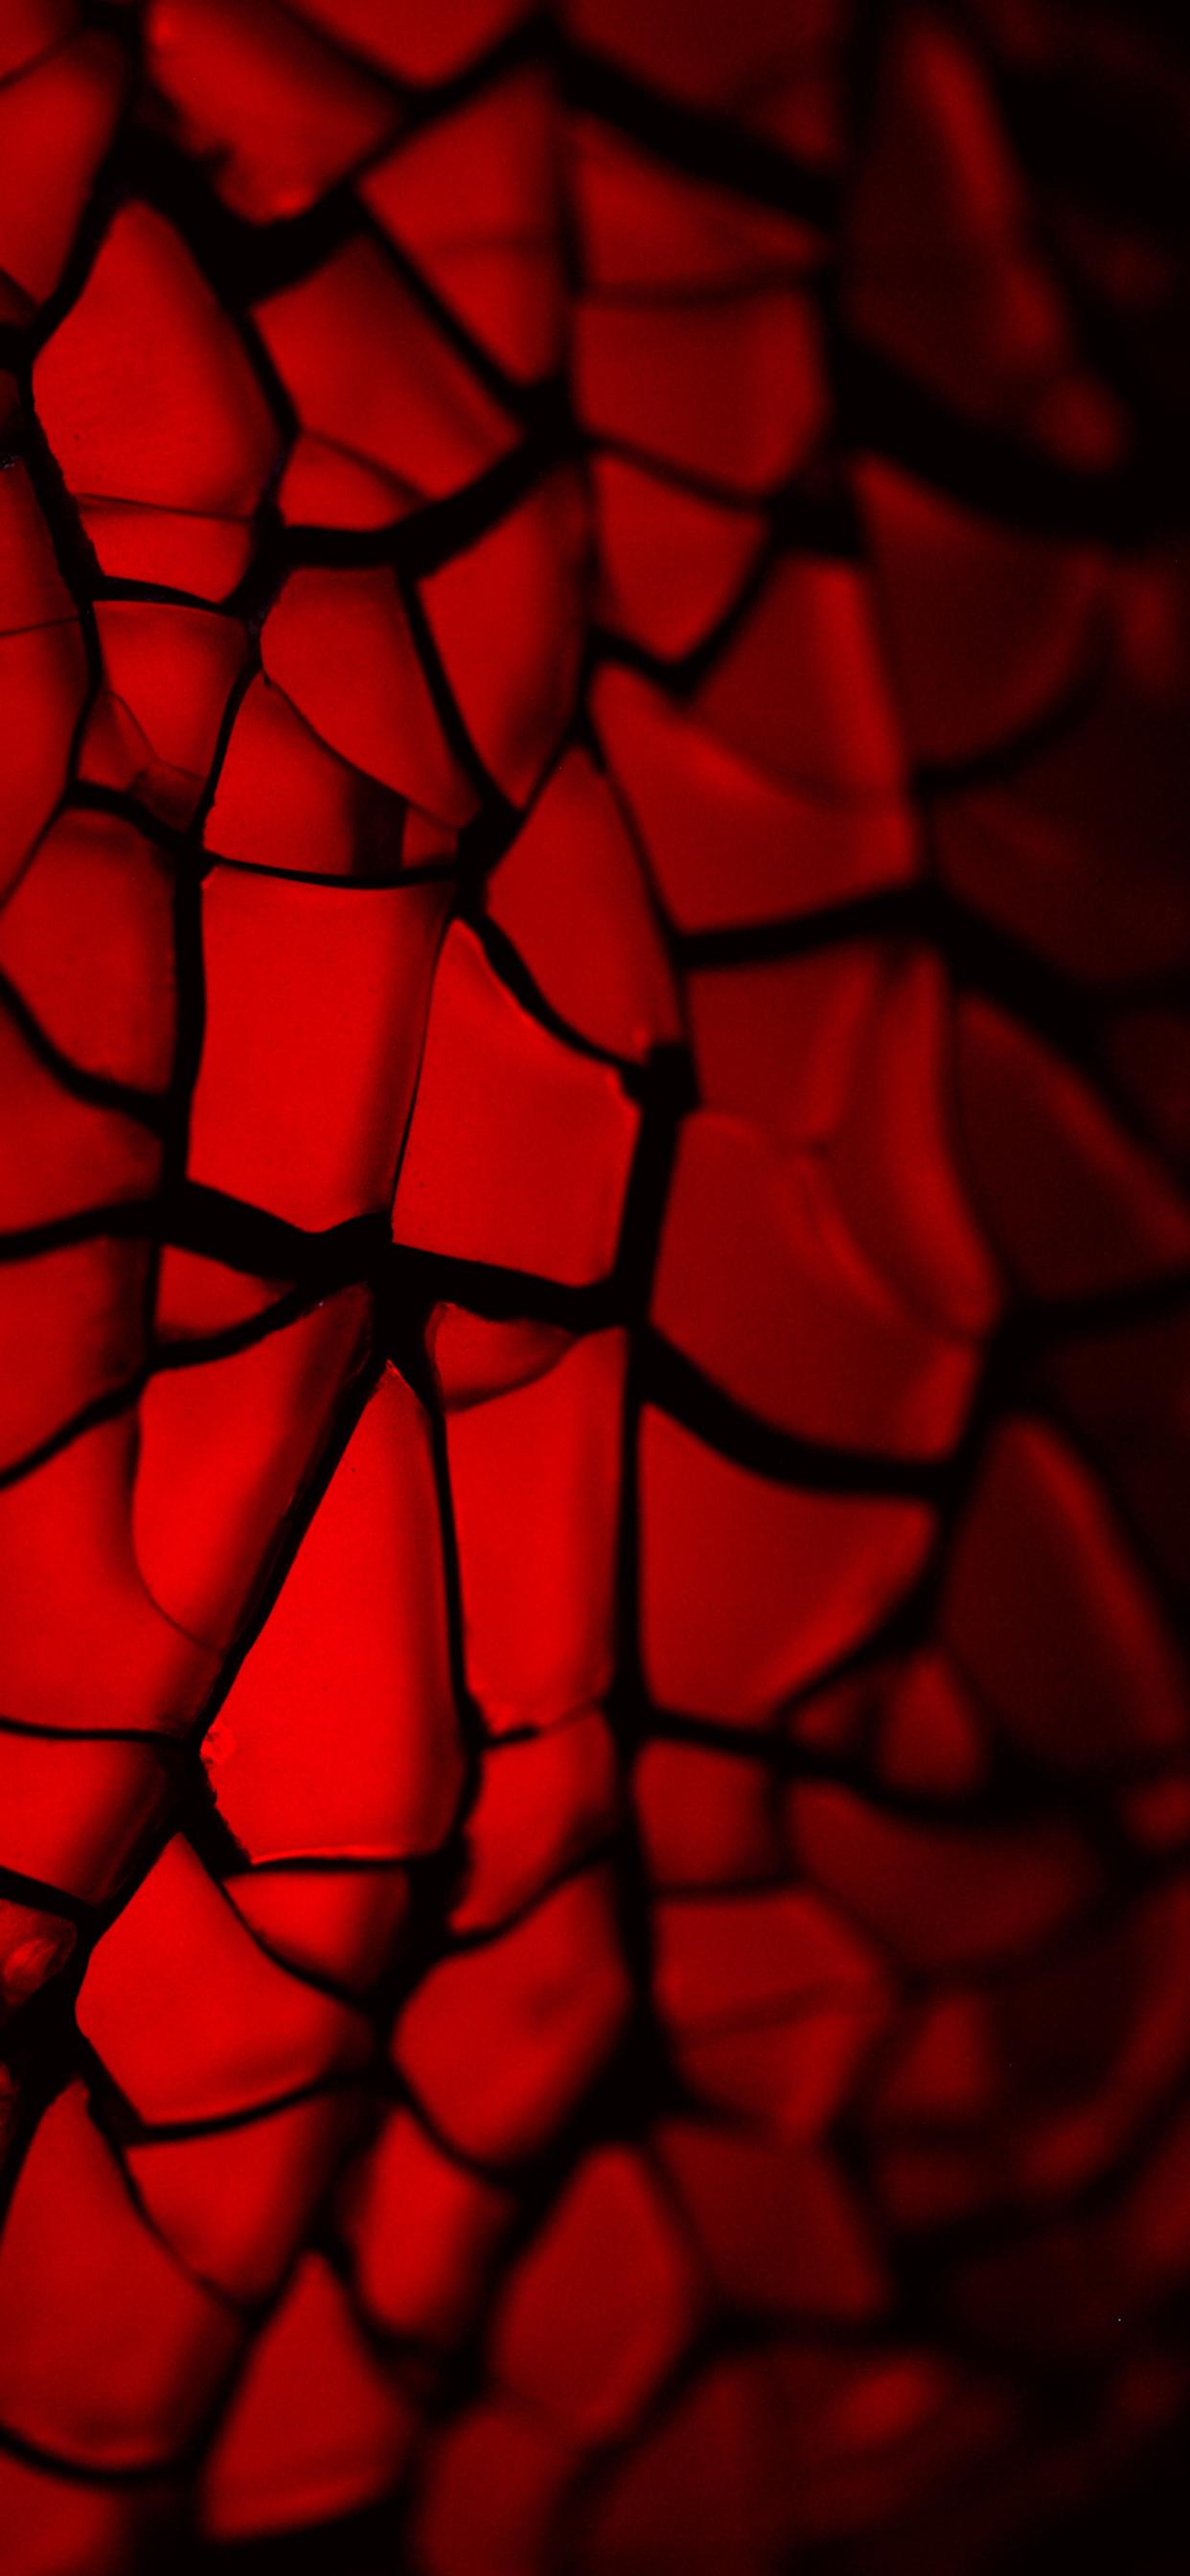 iPhone wallpapers abstract glass dark red Fonds d'écran iPhone du 28/01/2020